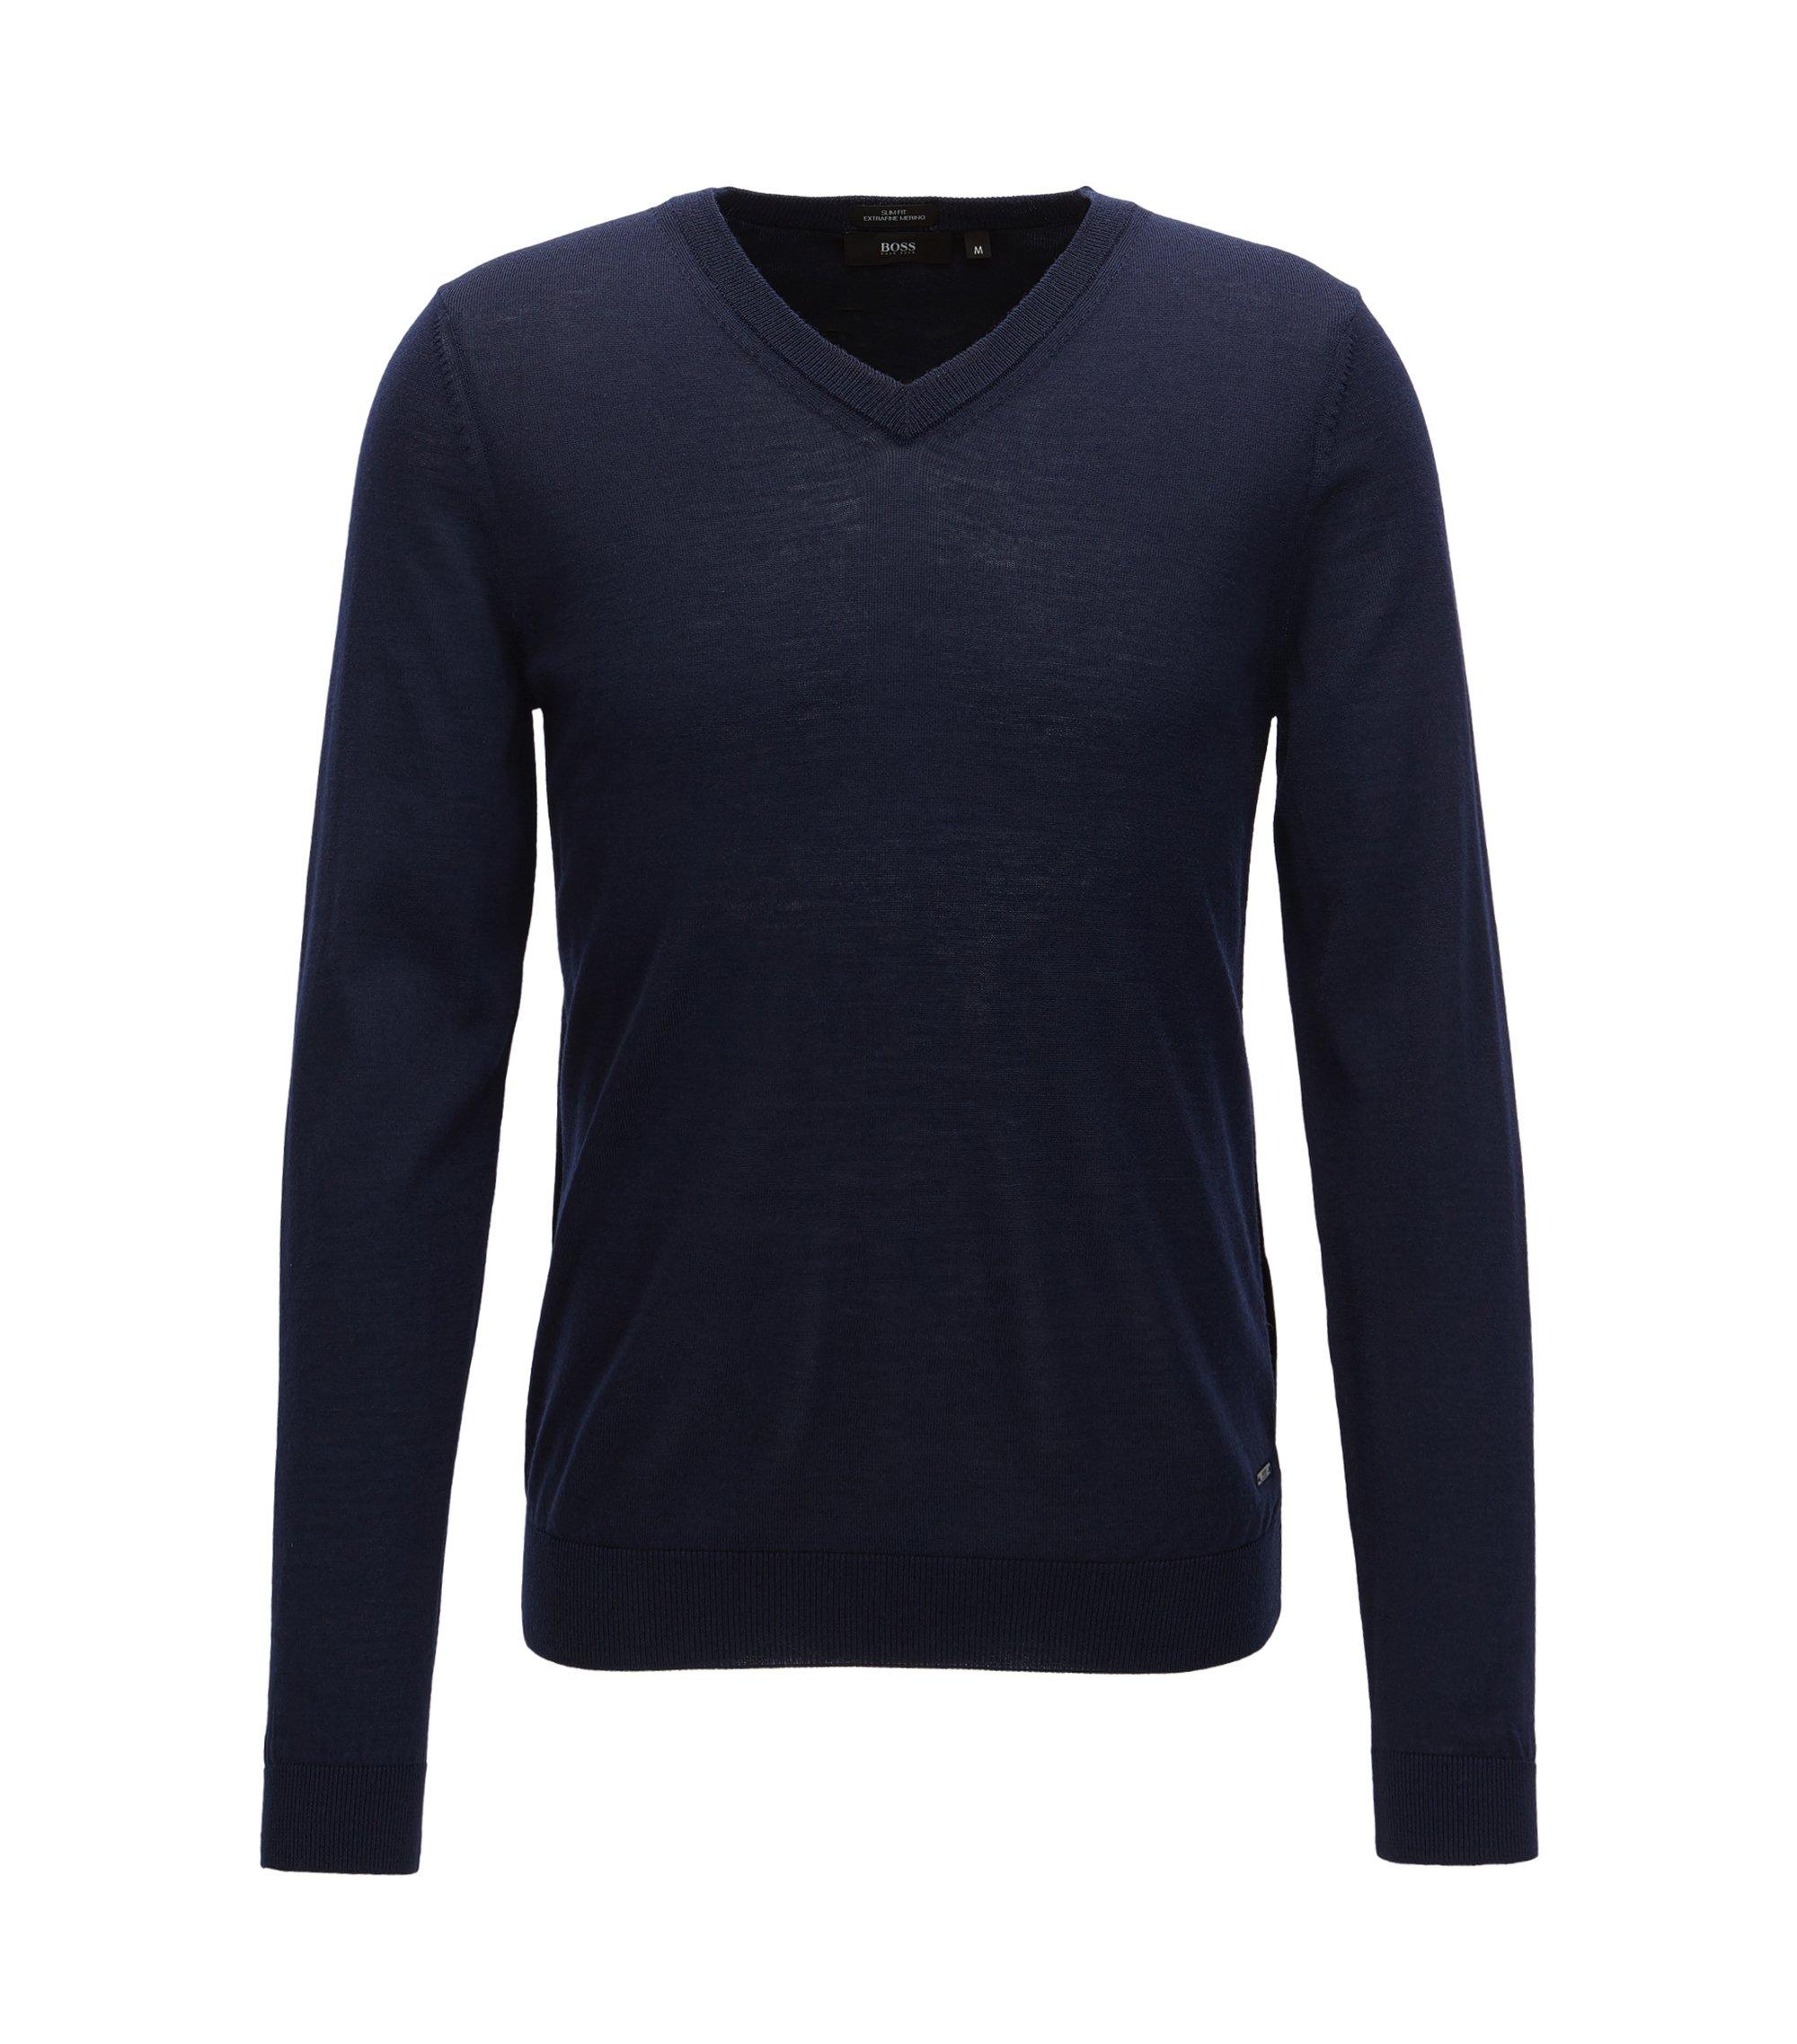 Trui met V-hals van mulesingvrije wol, Donkerblauw